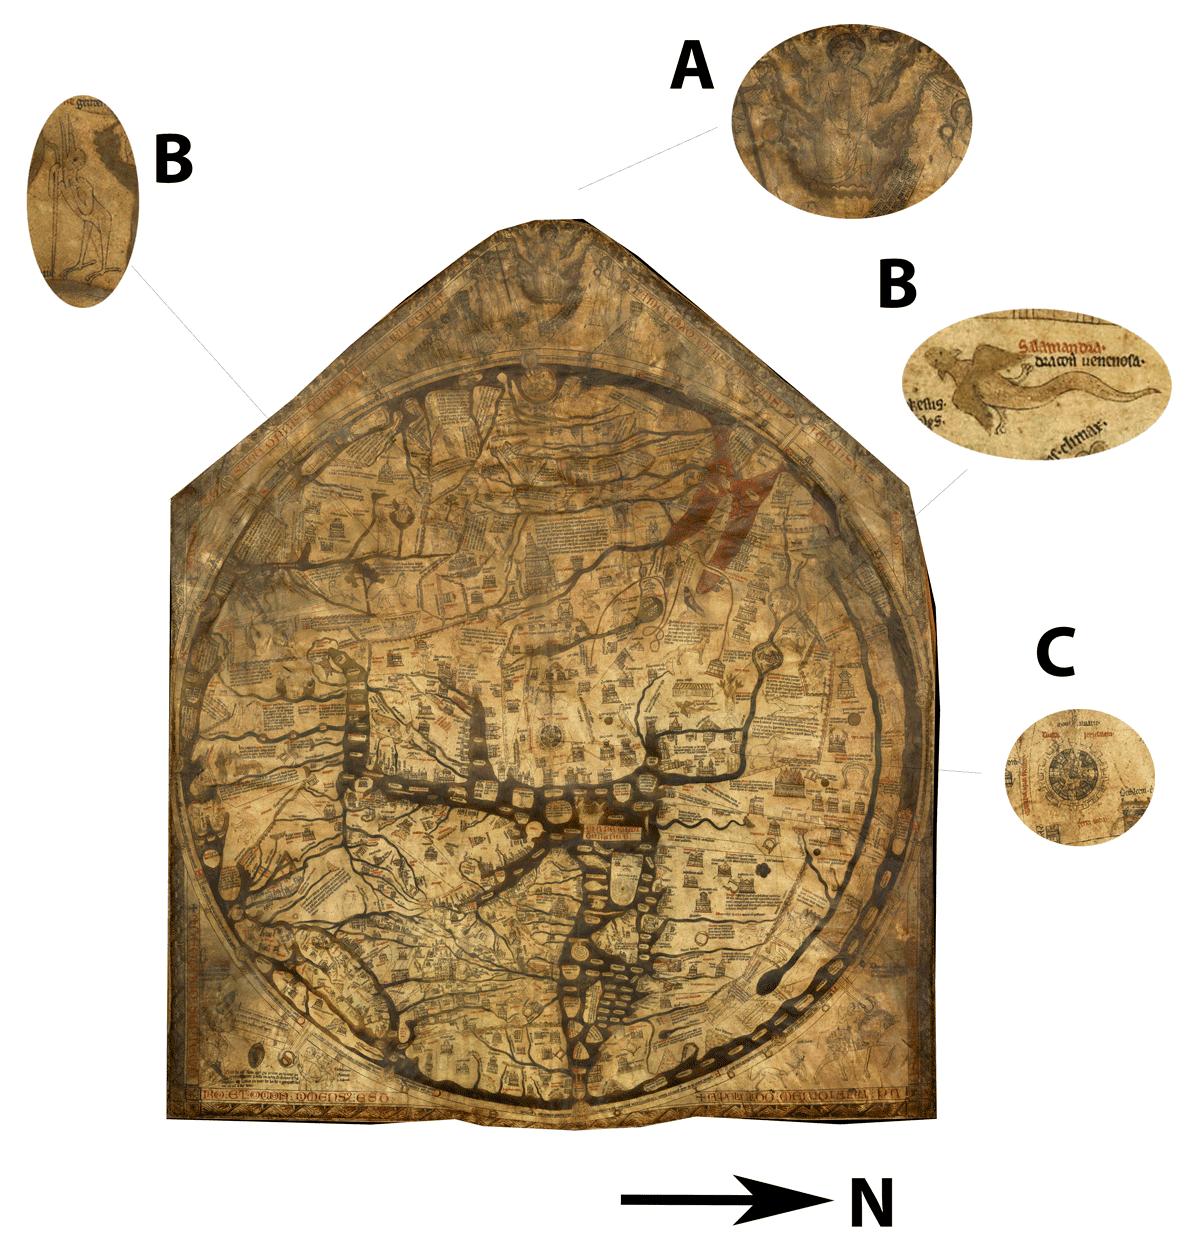 Hereford Mappa Mundi, circa 1300 CE